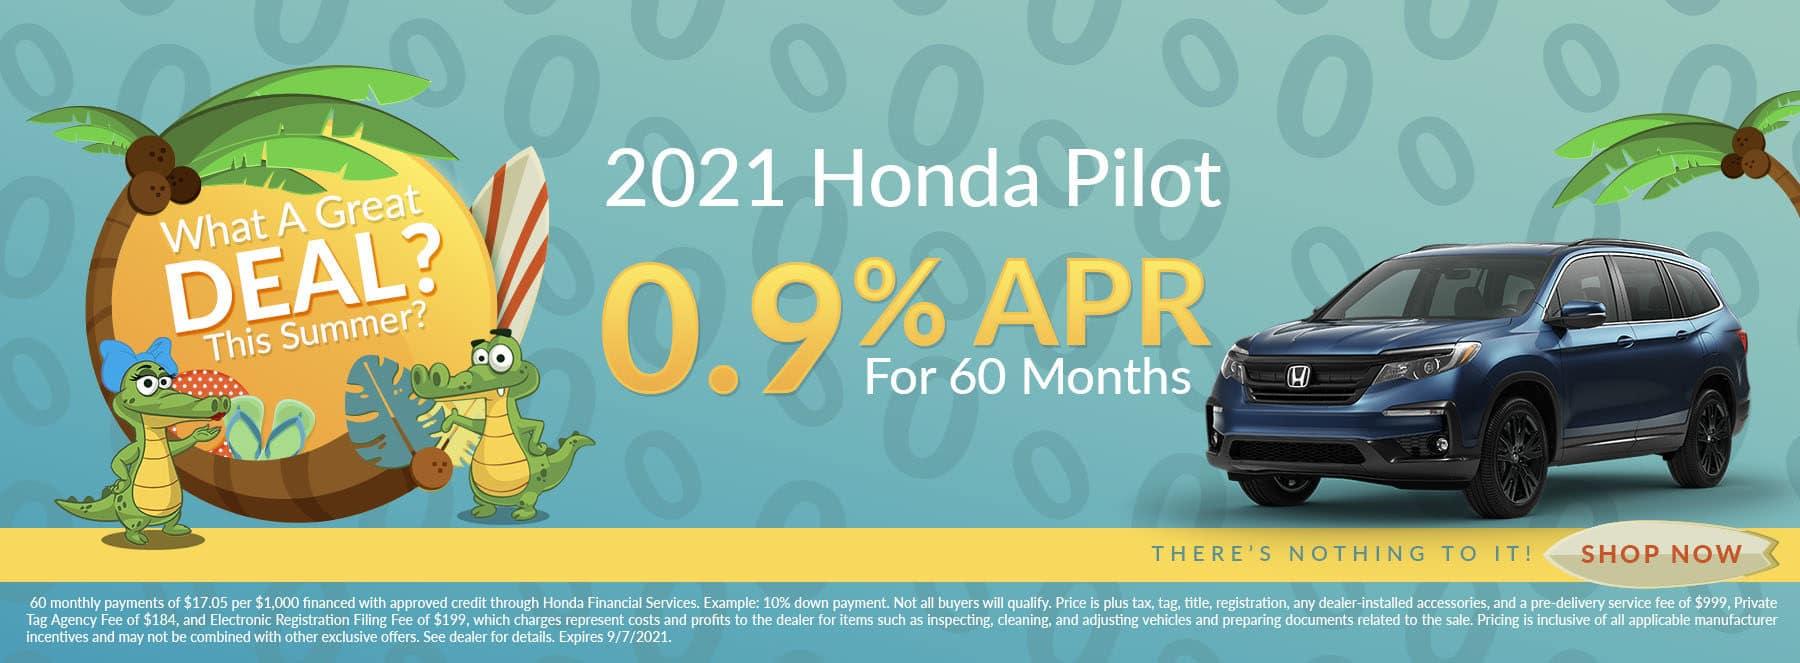 Want A Great Deal This Summer? | 2021 Honda Pilot | 0.9% APR For 60 Months